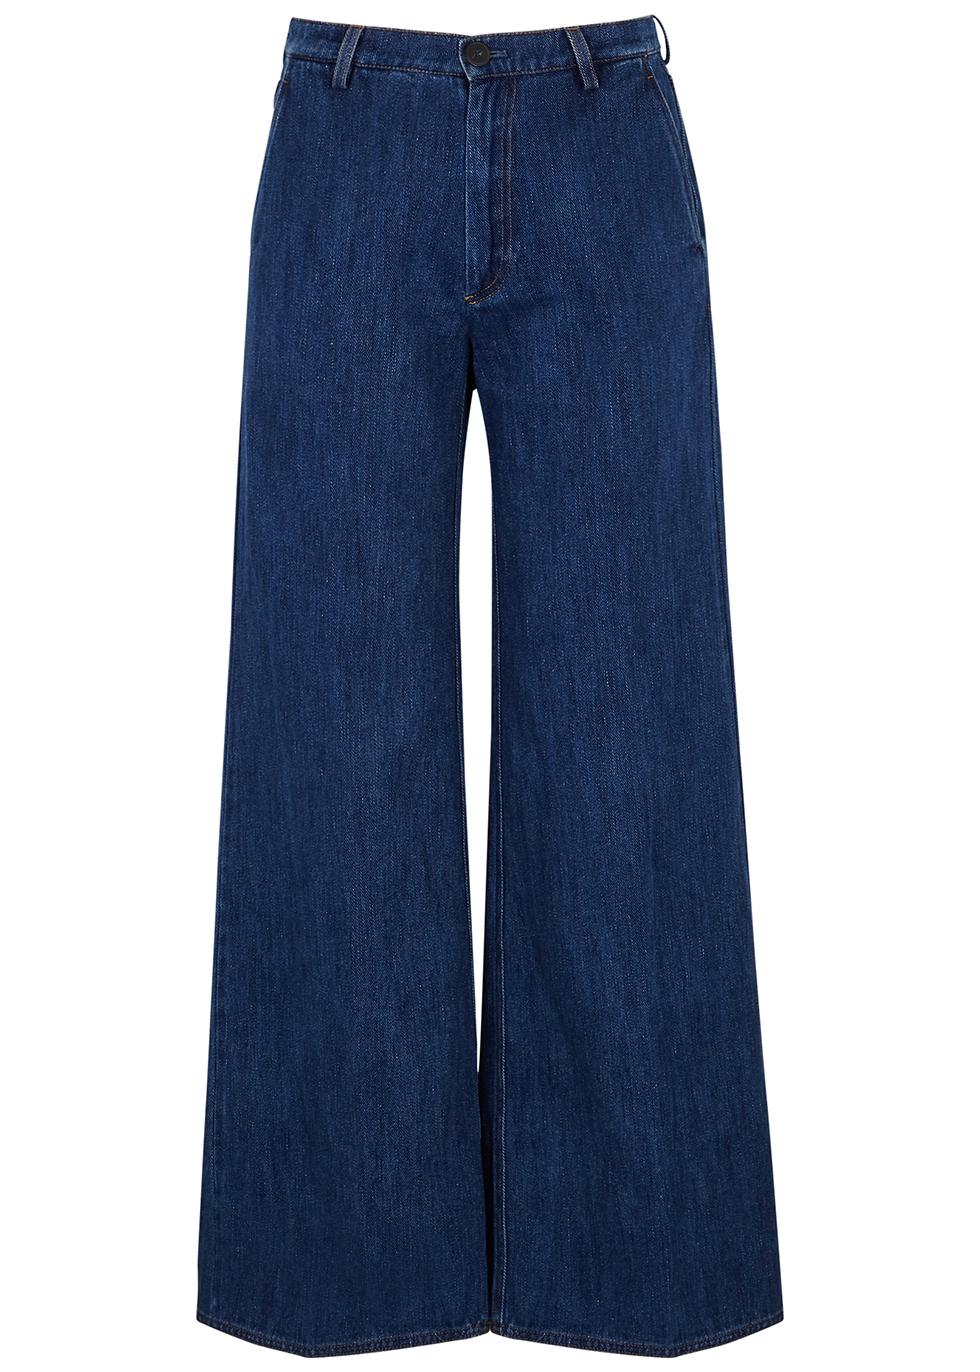 Cavalry dark blue wide-leg jeans